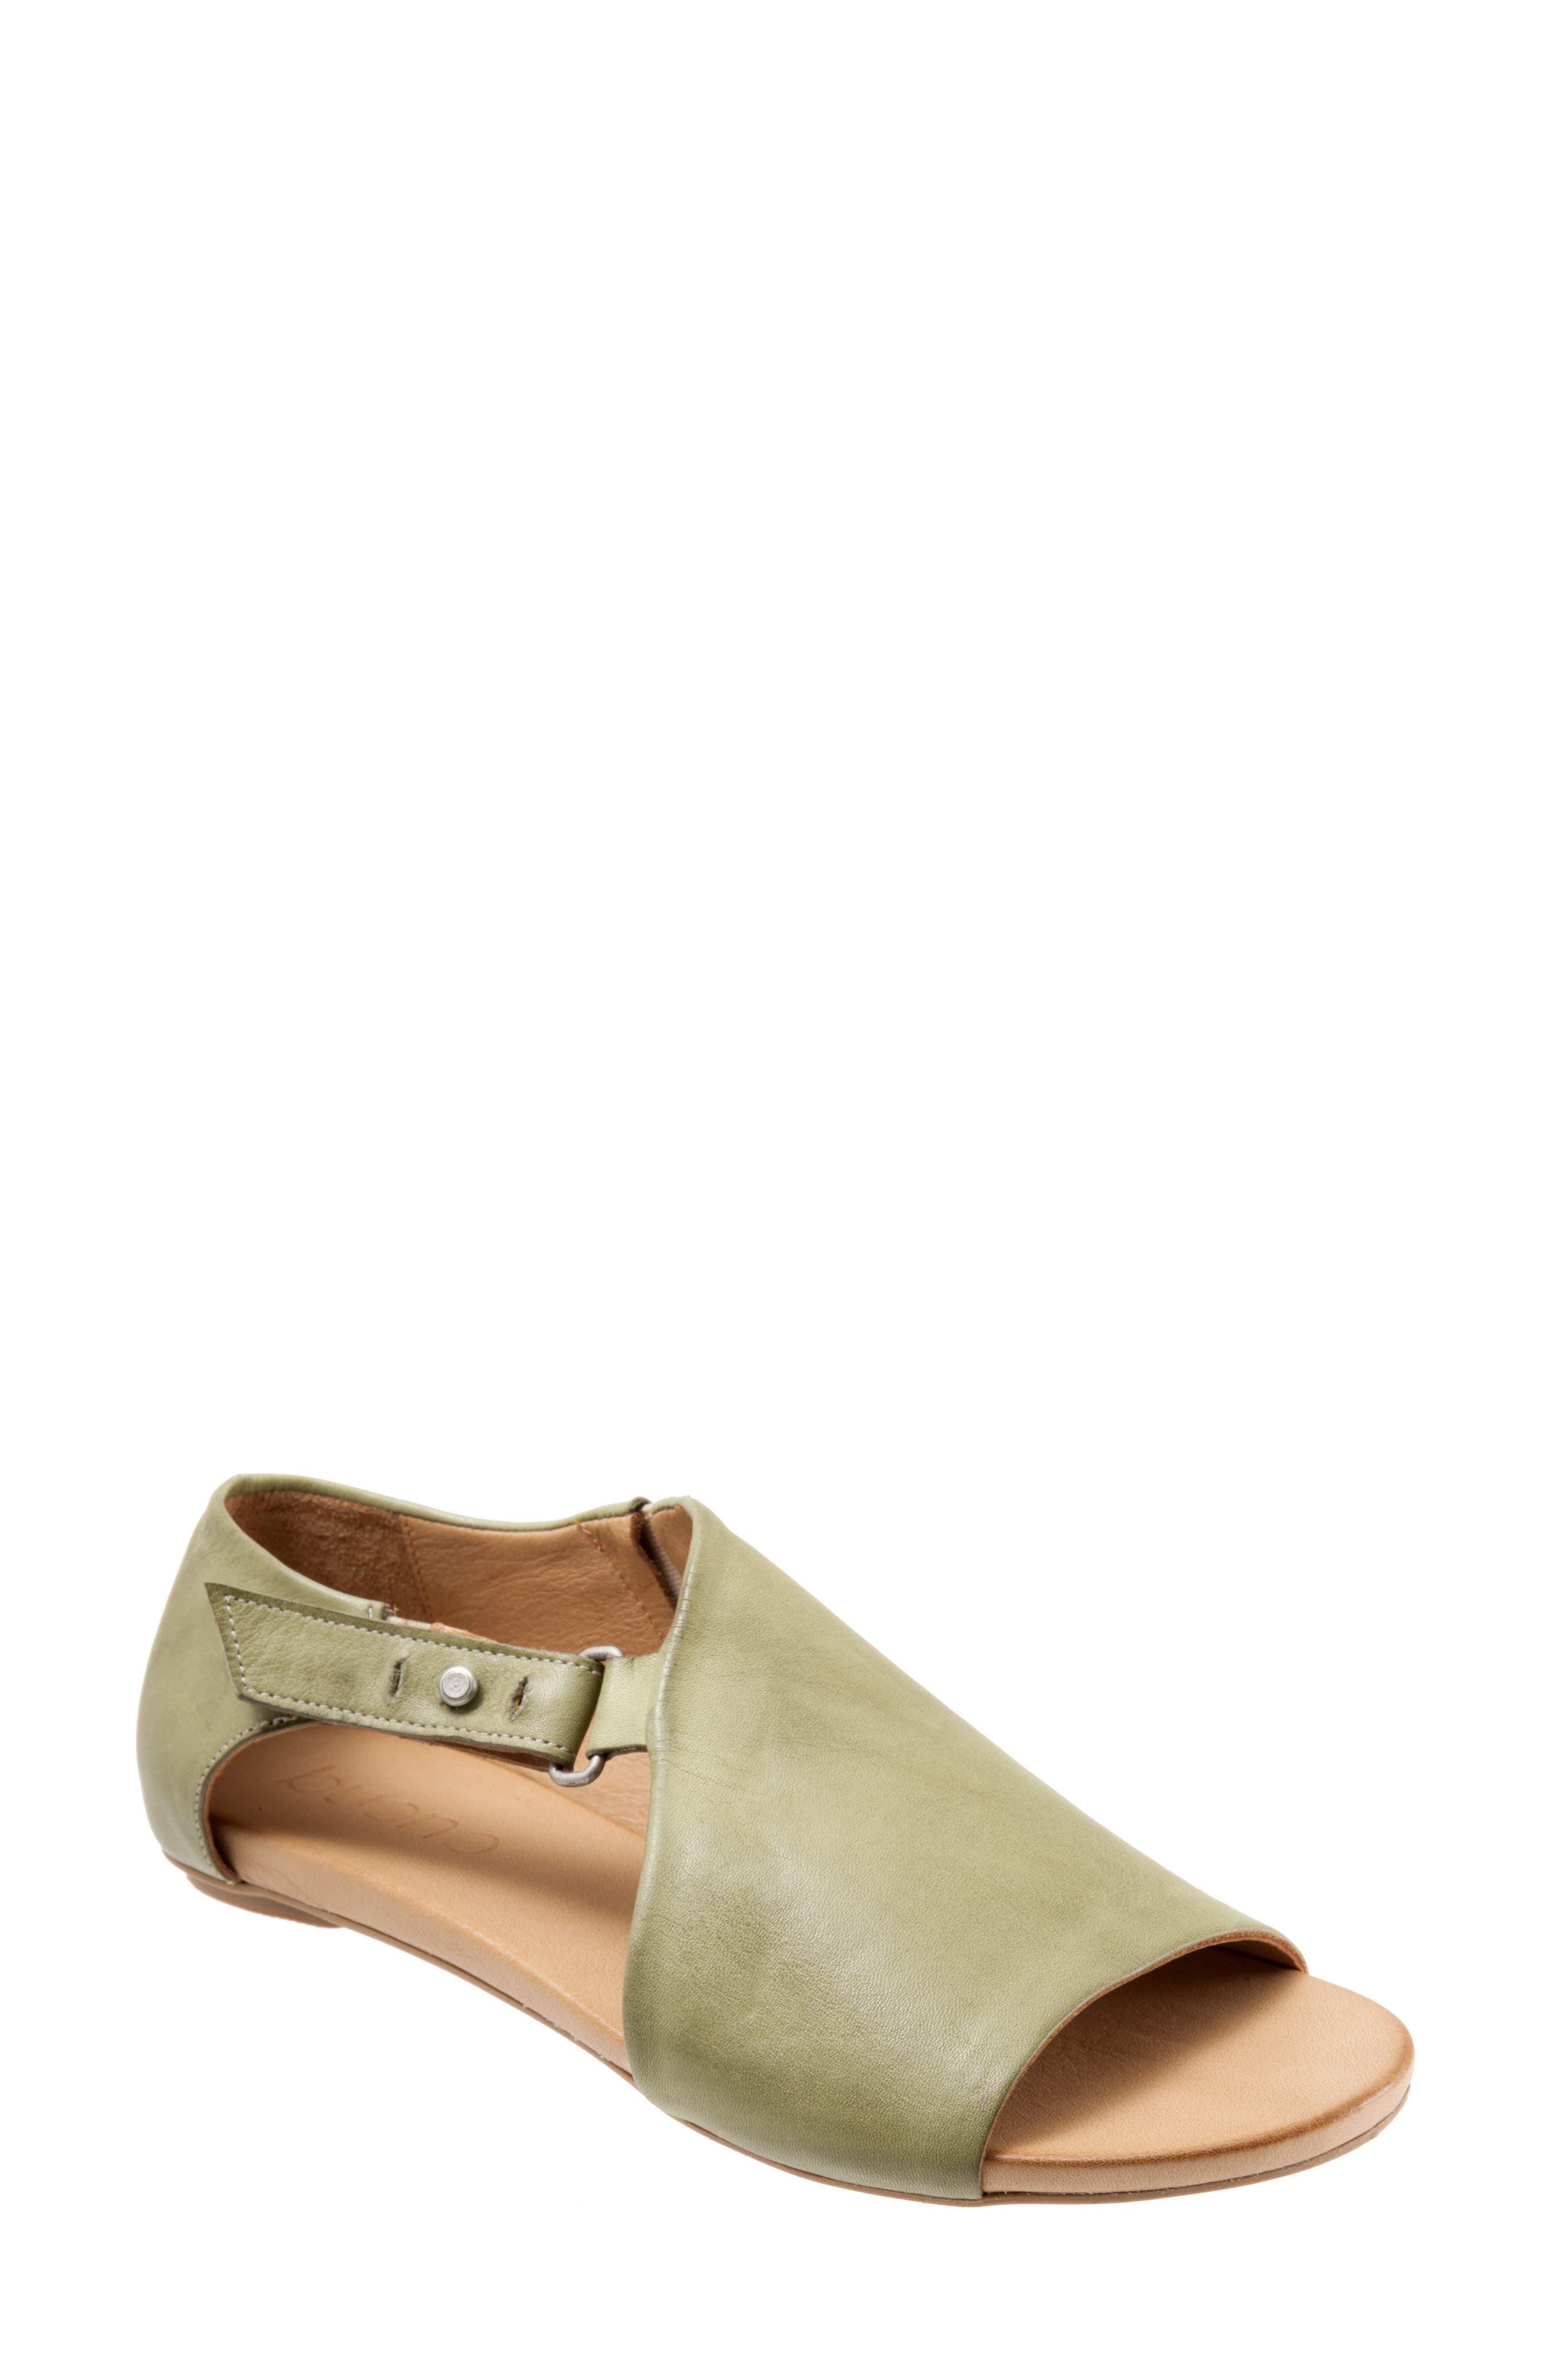 Kale Sandal,                             Main thumbnail 1, color,                             Moss Leather